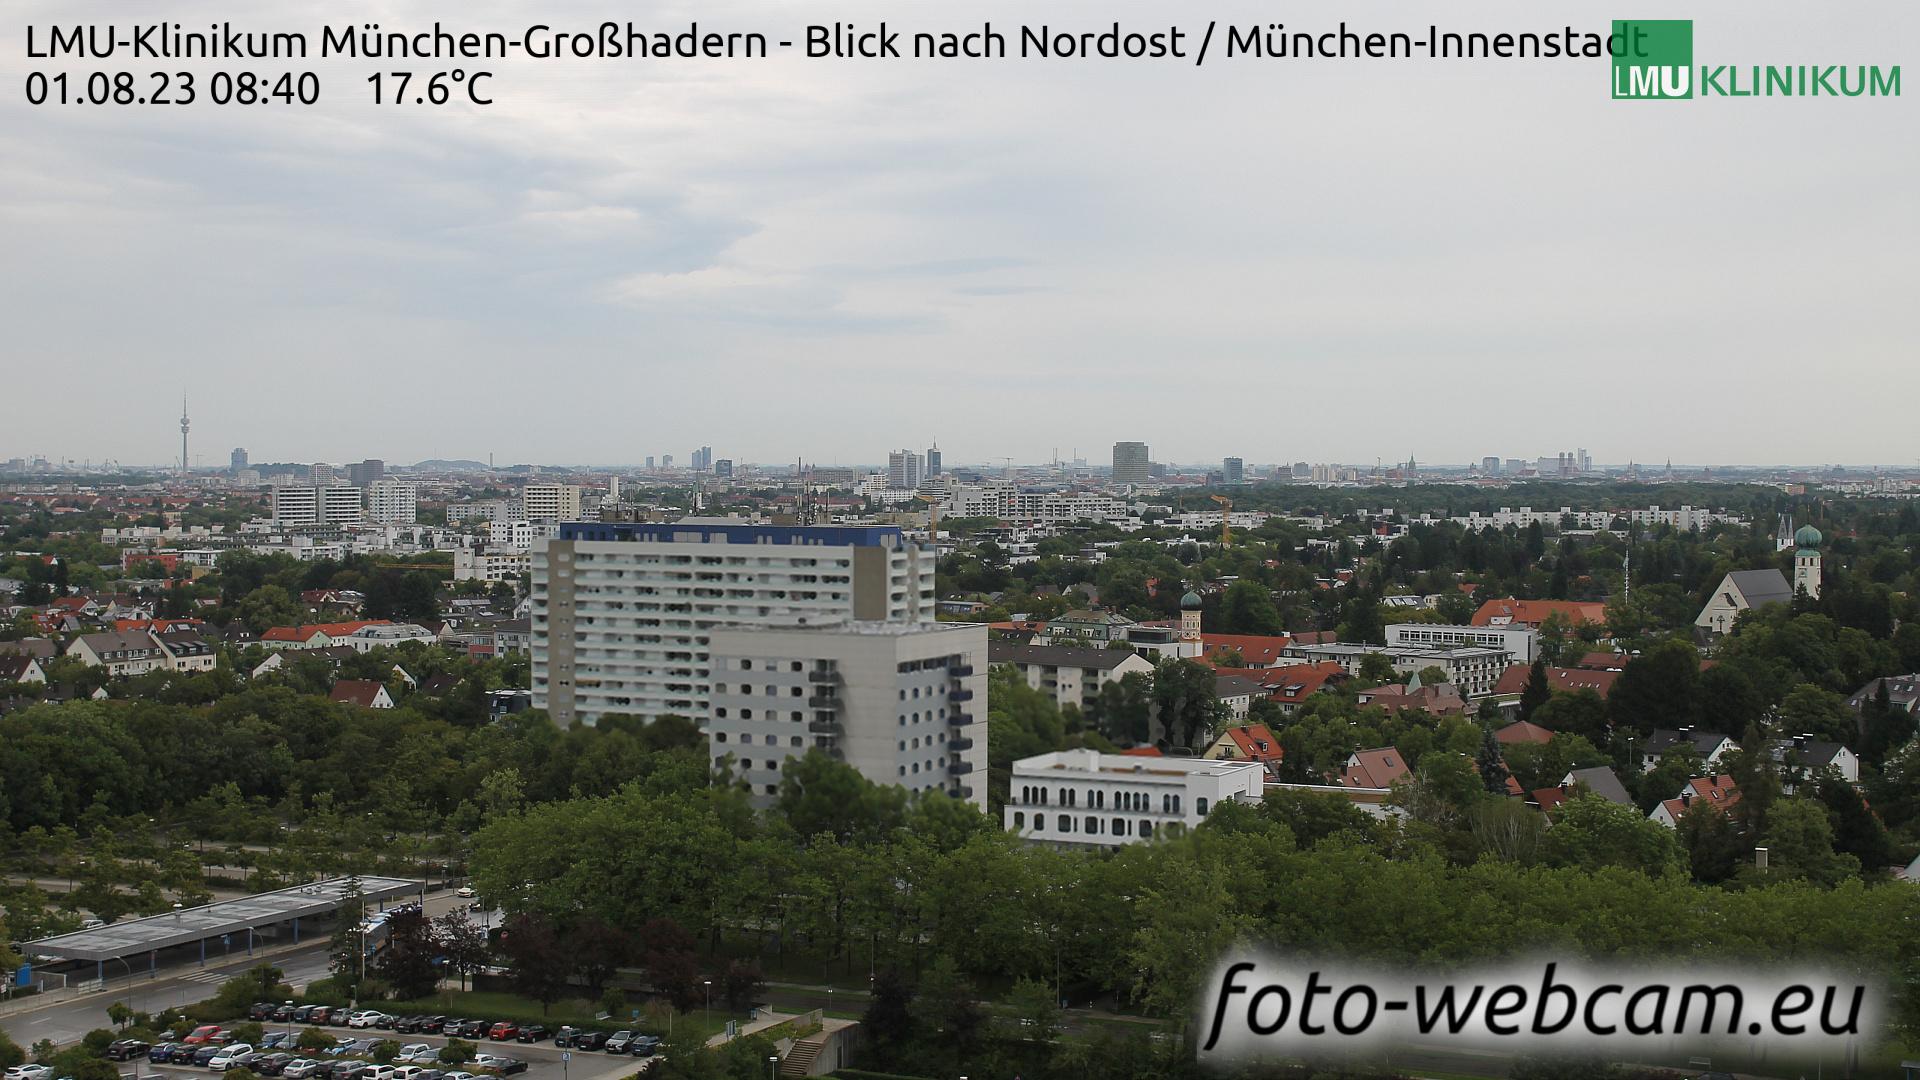 Munich Mon. 08:47